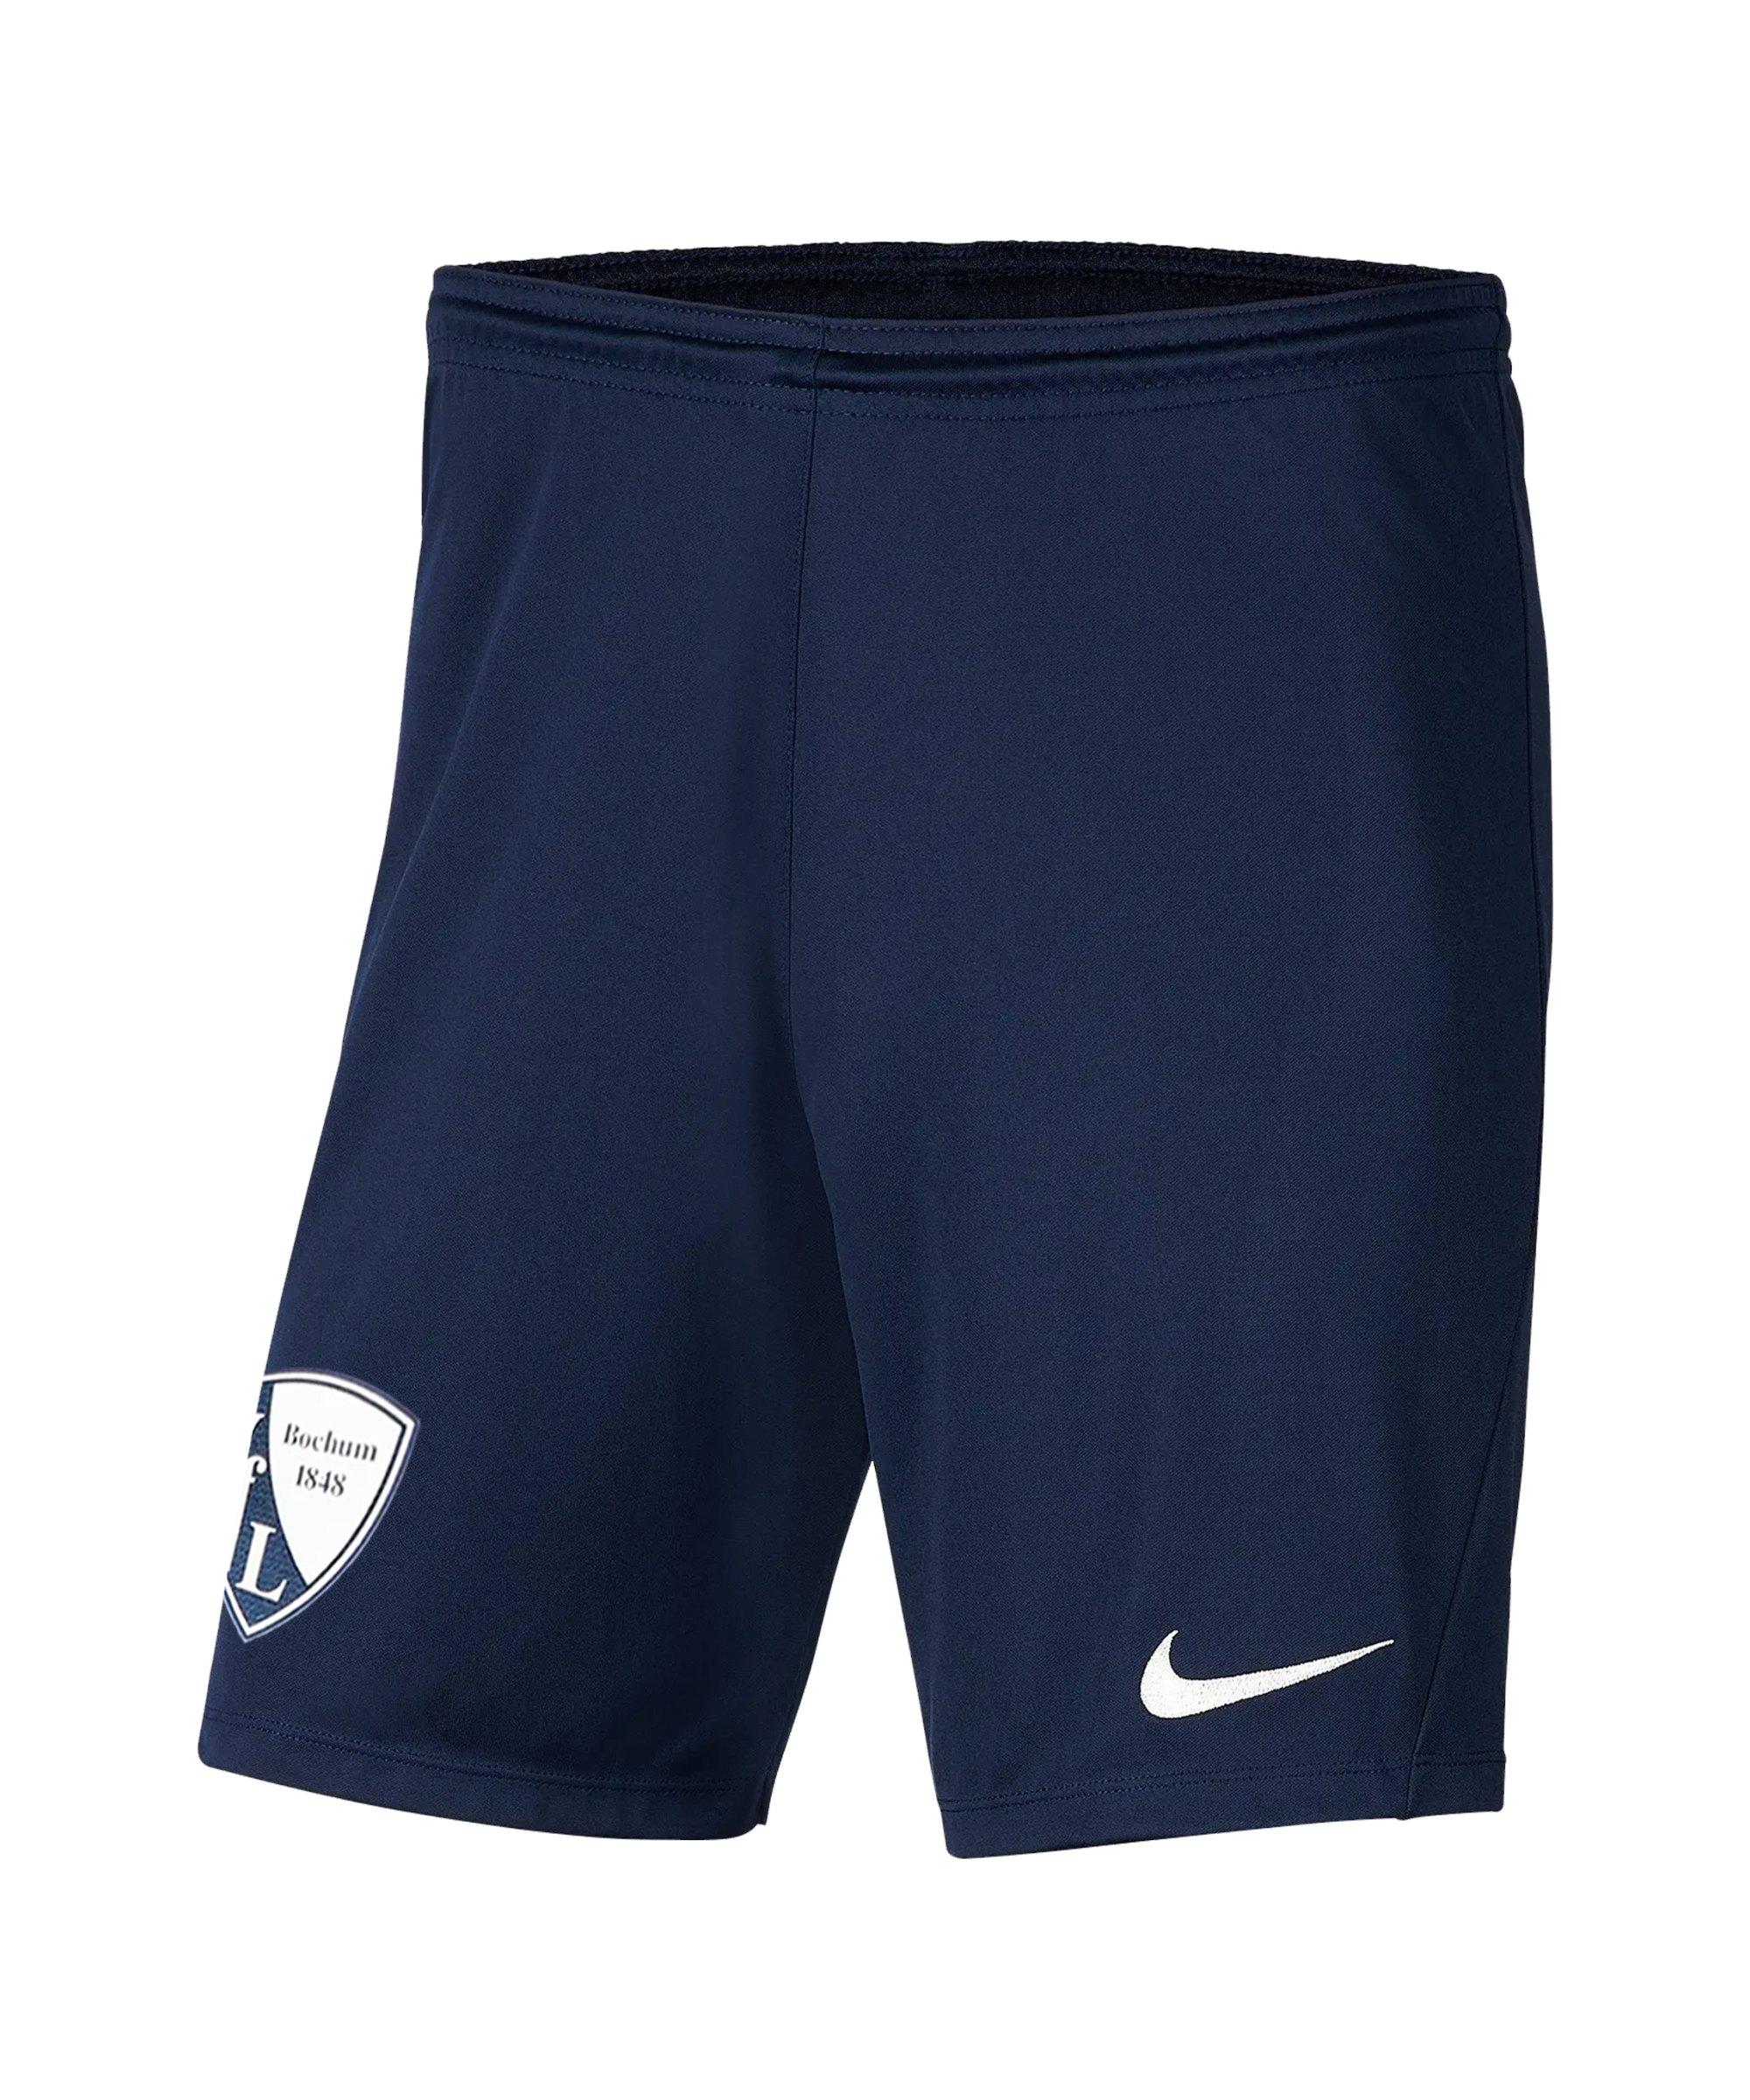 Nike VfL Bochum Short Home 2021/2022 Blau F410 - blau